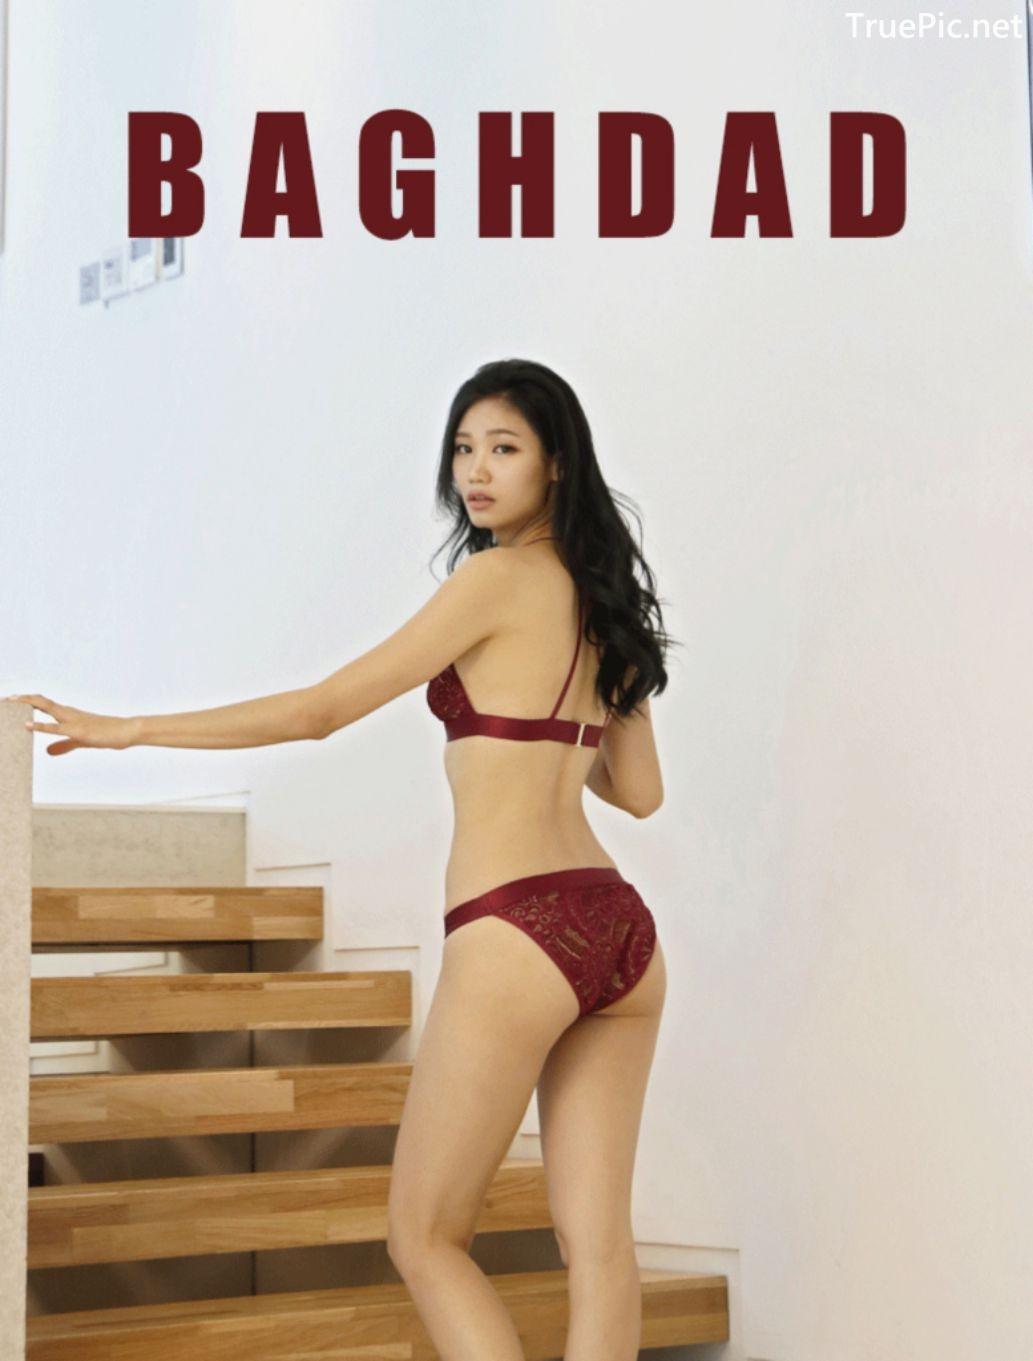 Image Korean Fashion Model - Lee Hee Eun - Baghdad Caffeine Burgundy Lingerie - TruePic.net - Picture-3